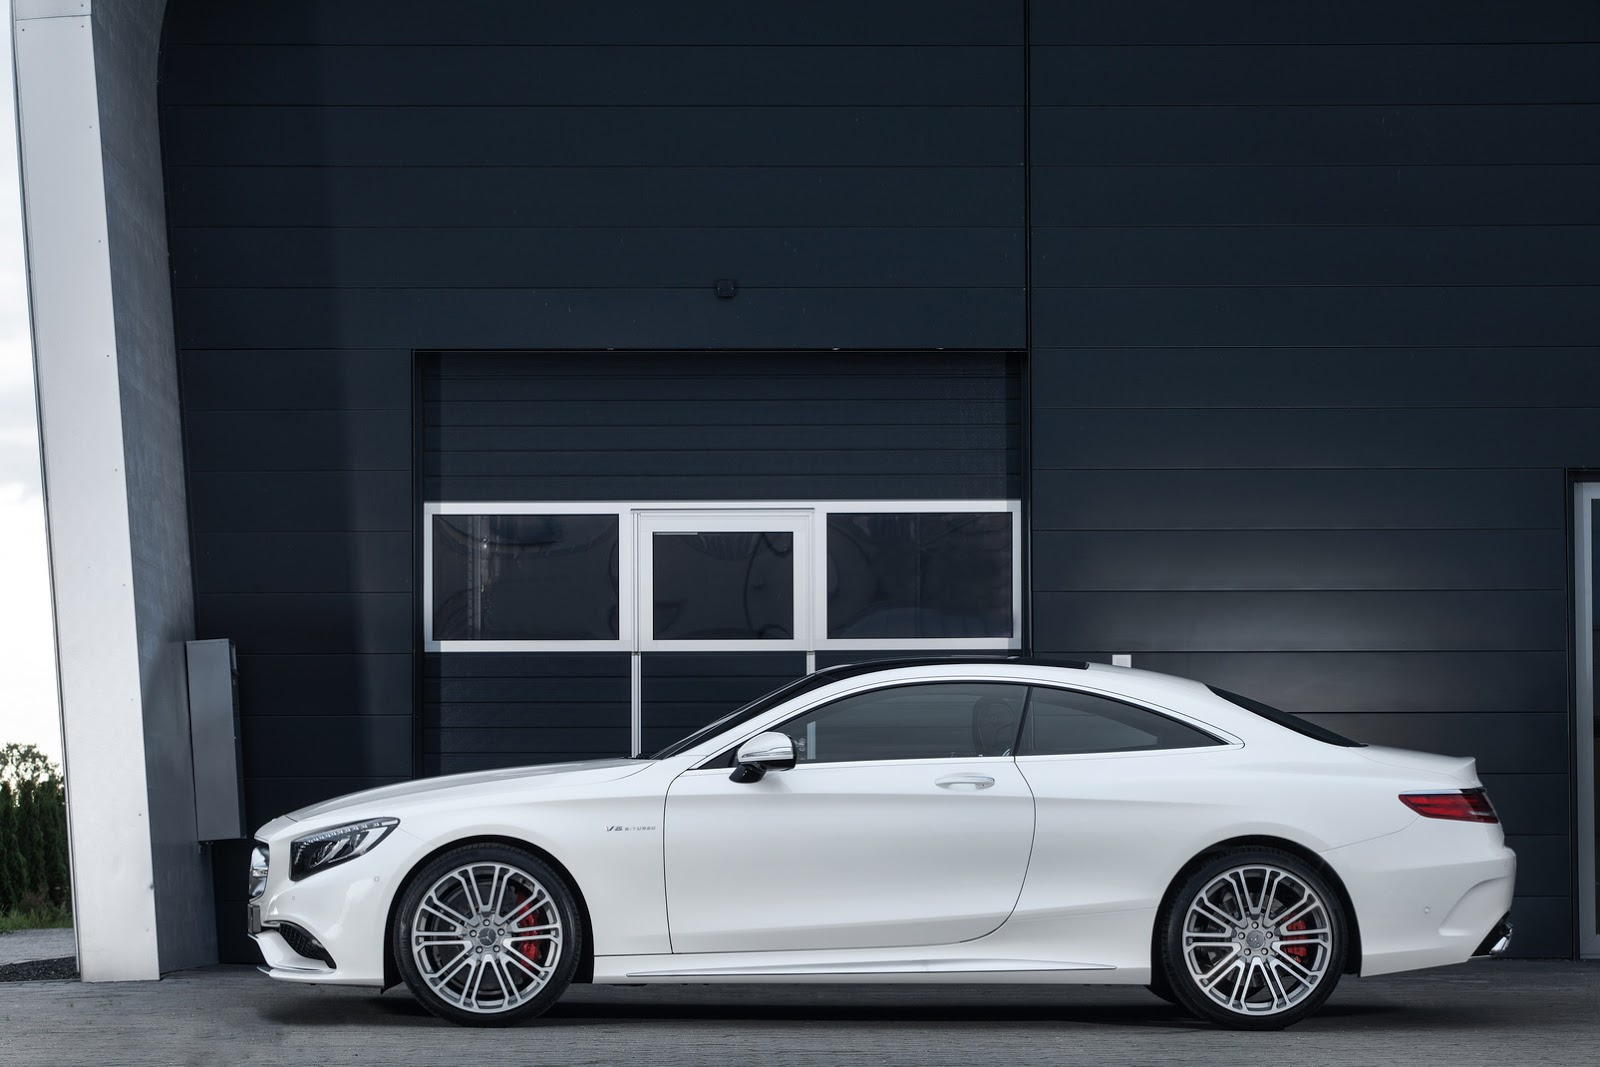 http://1.bp.blogspot.com/-EUzZ2JtZhRo/VGpDhhnqtiI/AAAAAAAAZio/WGr91K4CTsM/s1600/IMSA-Mercedes-S63-AMG-Coupe2.jpg